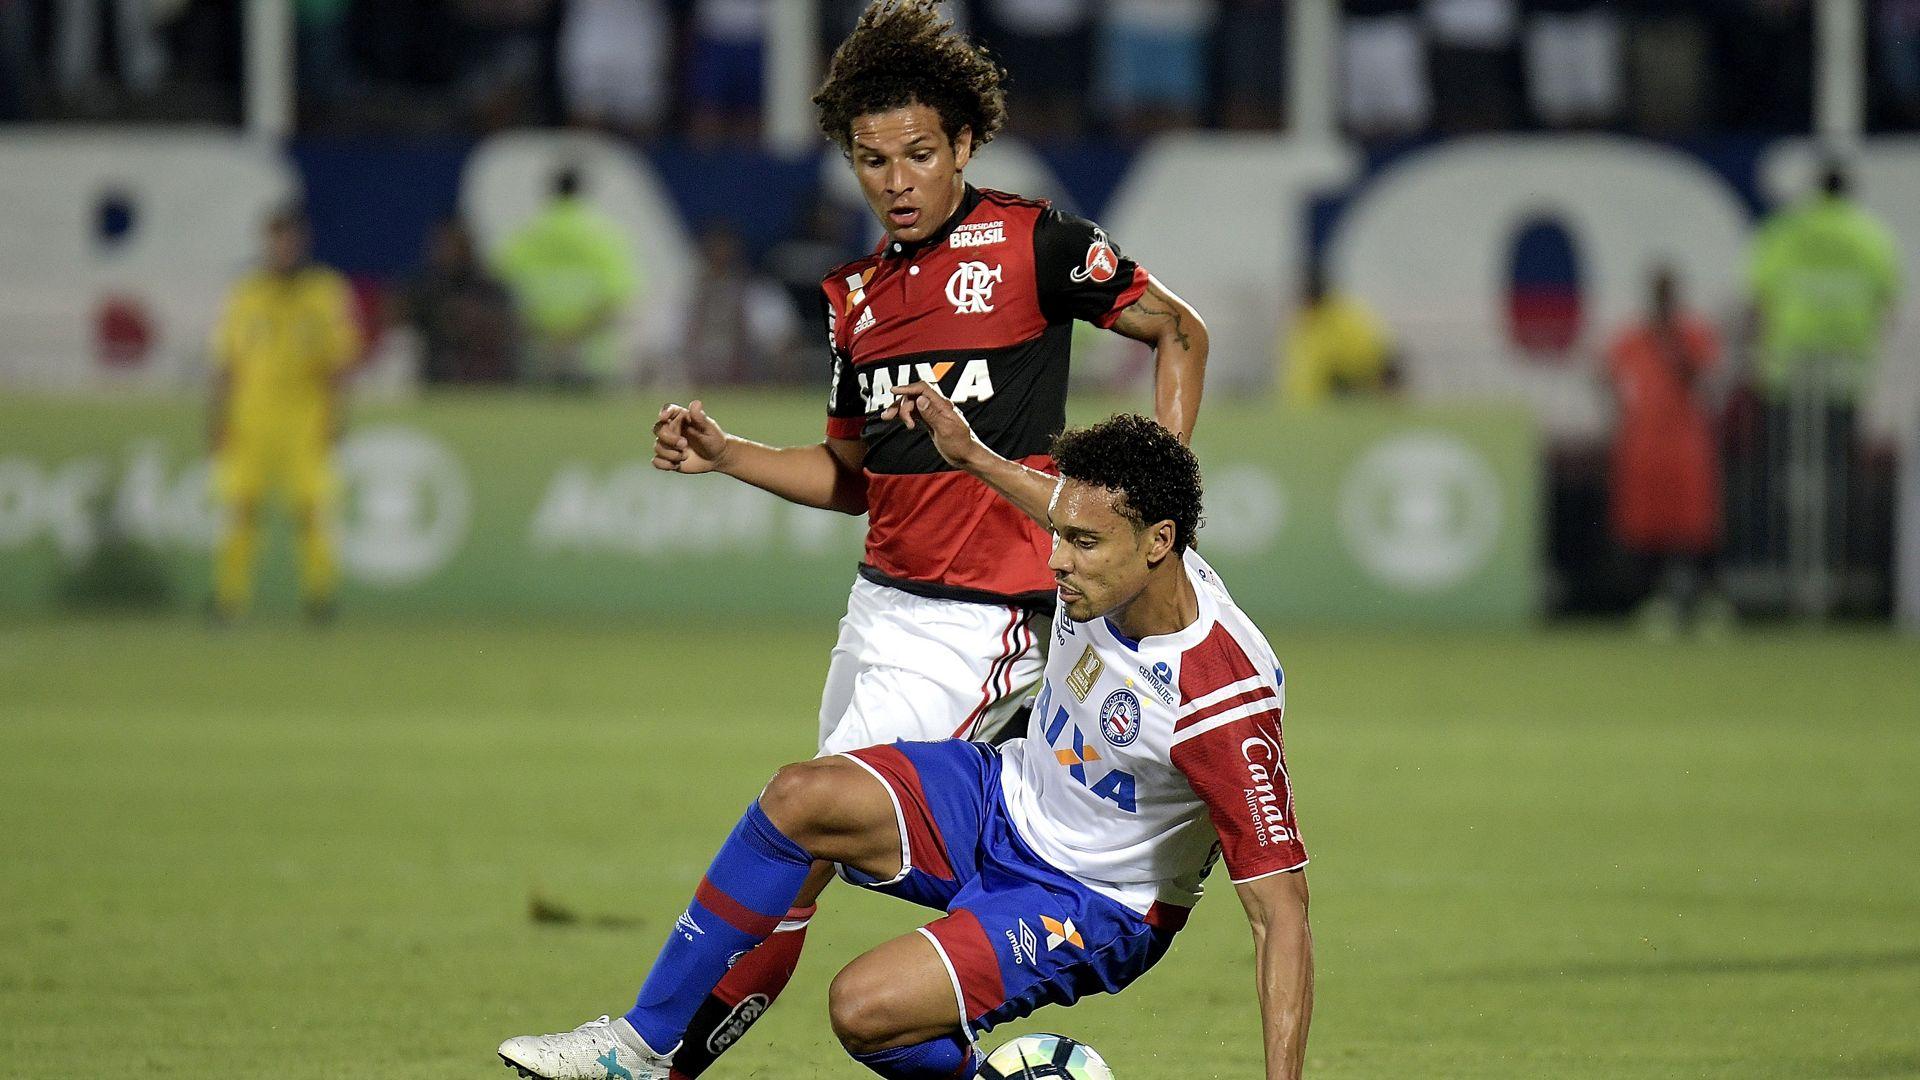 Willian Arao Edigar Junio Flamengo Bahia Brasileirao Serie A 19102017